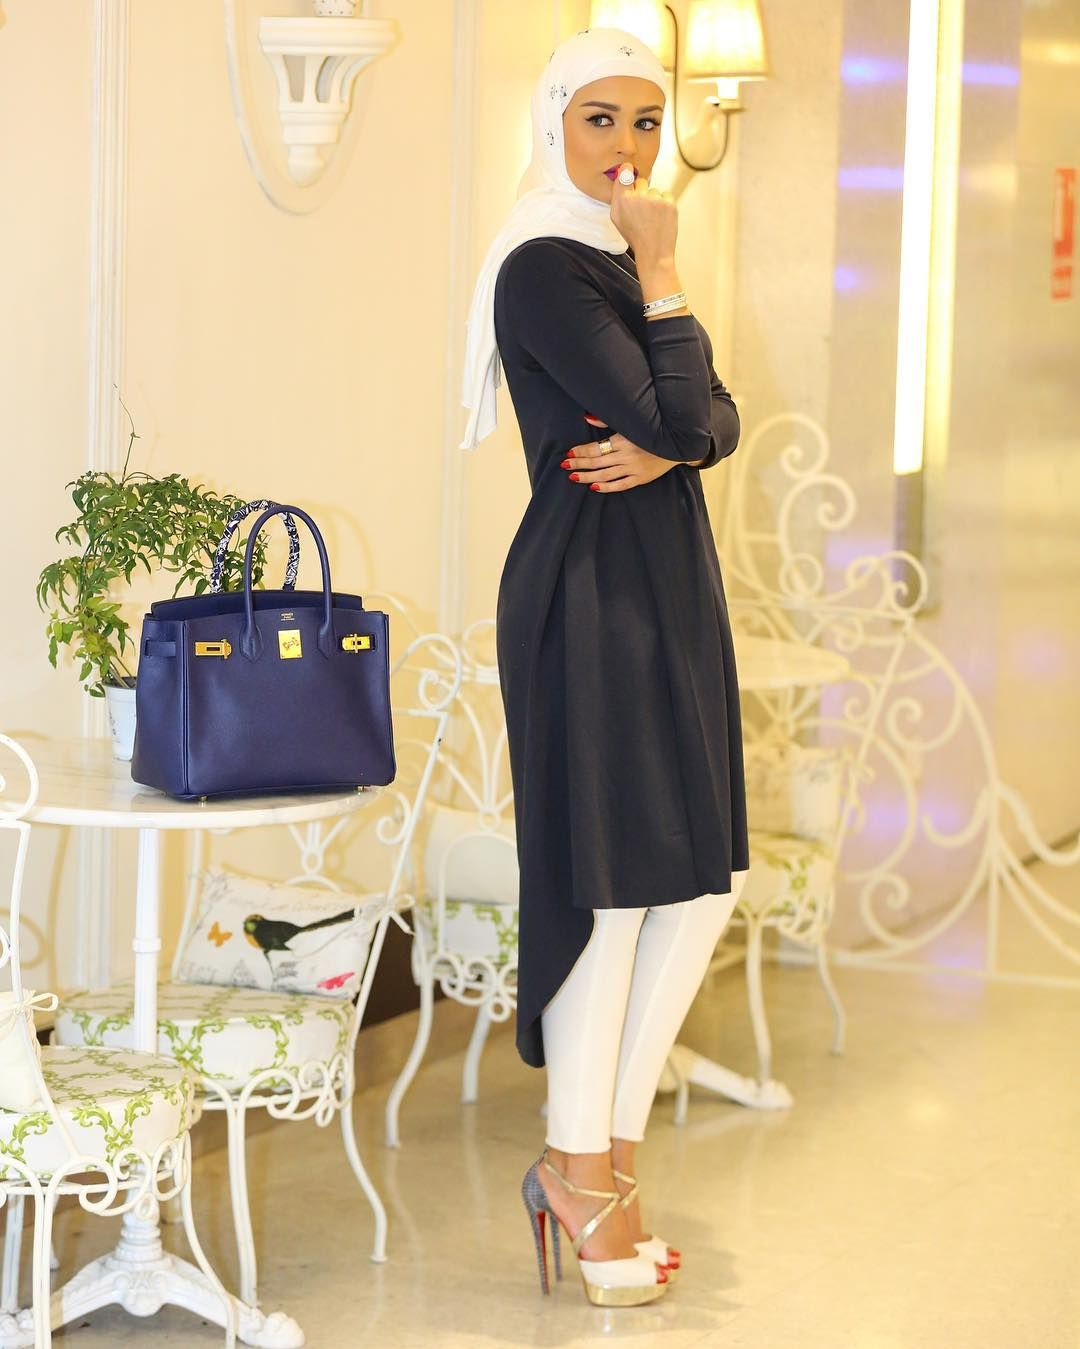 b3a384bad225 Fashion & Beauty, Kuwait Business Inquiries: dalalidblog@gmail.com  Snapchat: Dalalid YouTube: Dalal AlDoub